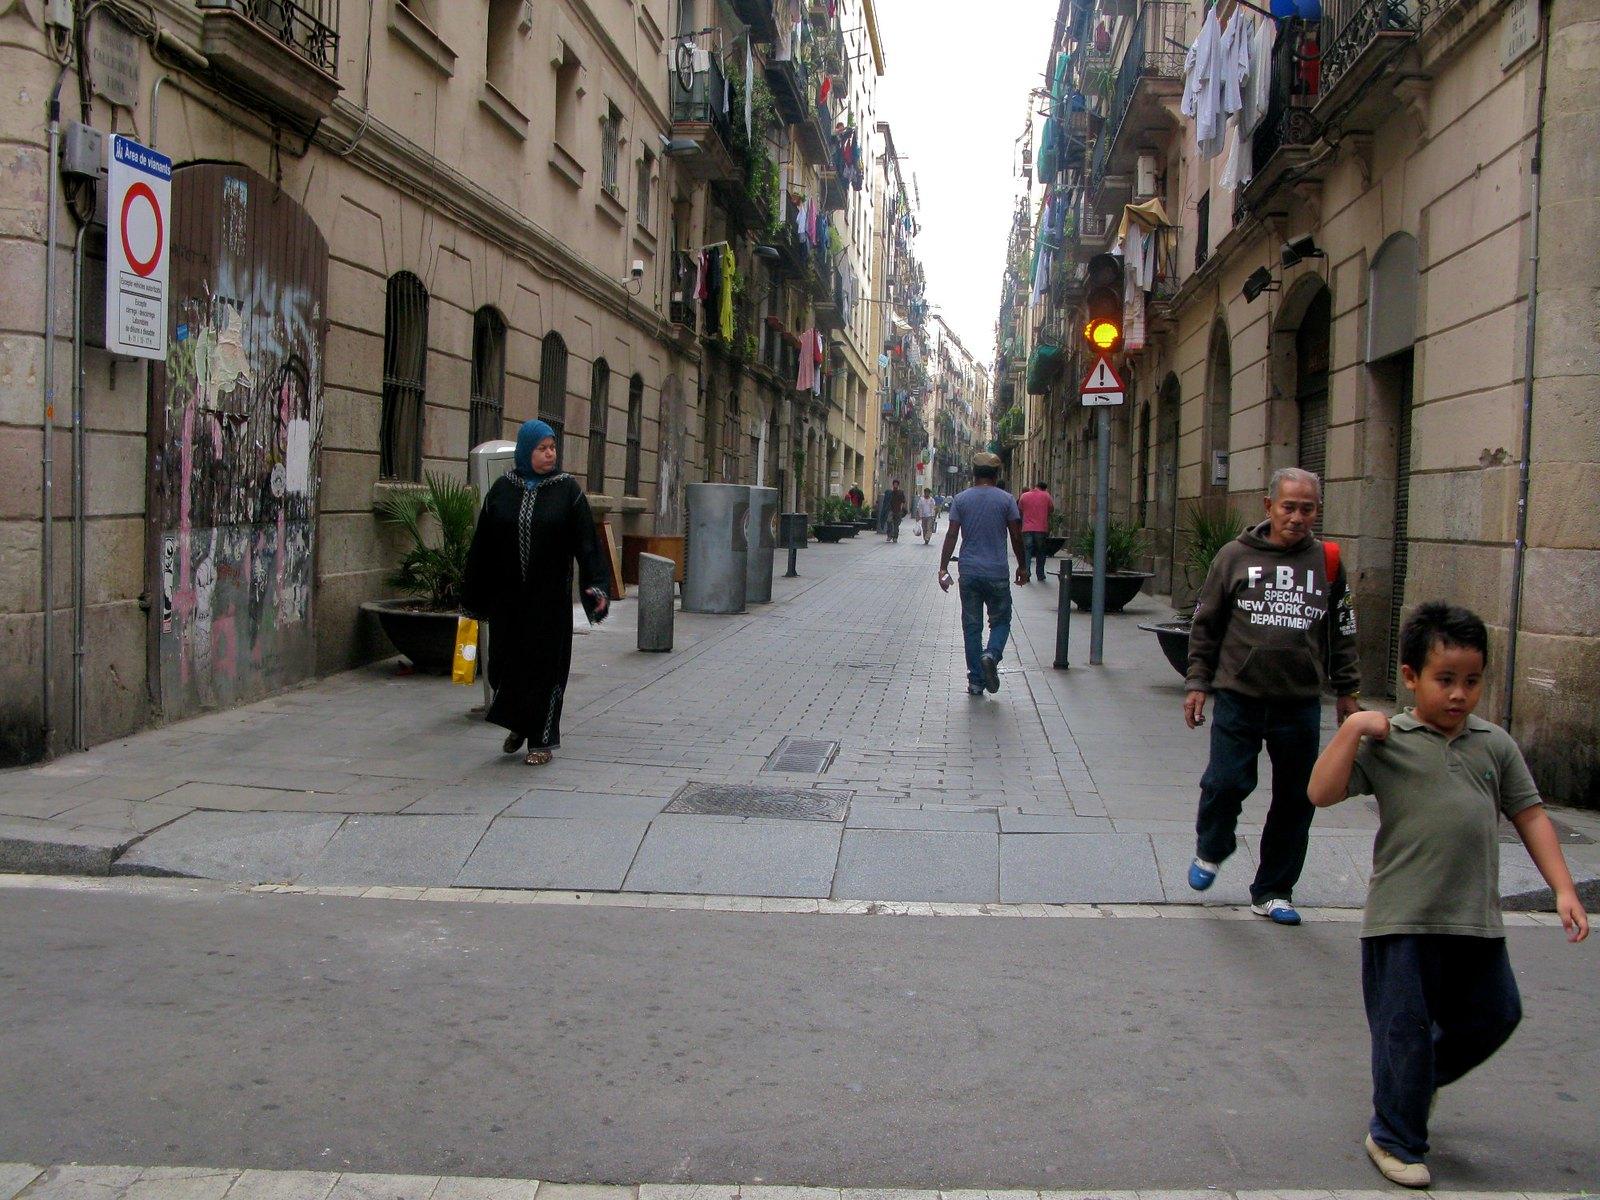 Barcelona's Largest Synagogue Vandalised With 'Free Palestine' Graffiti